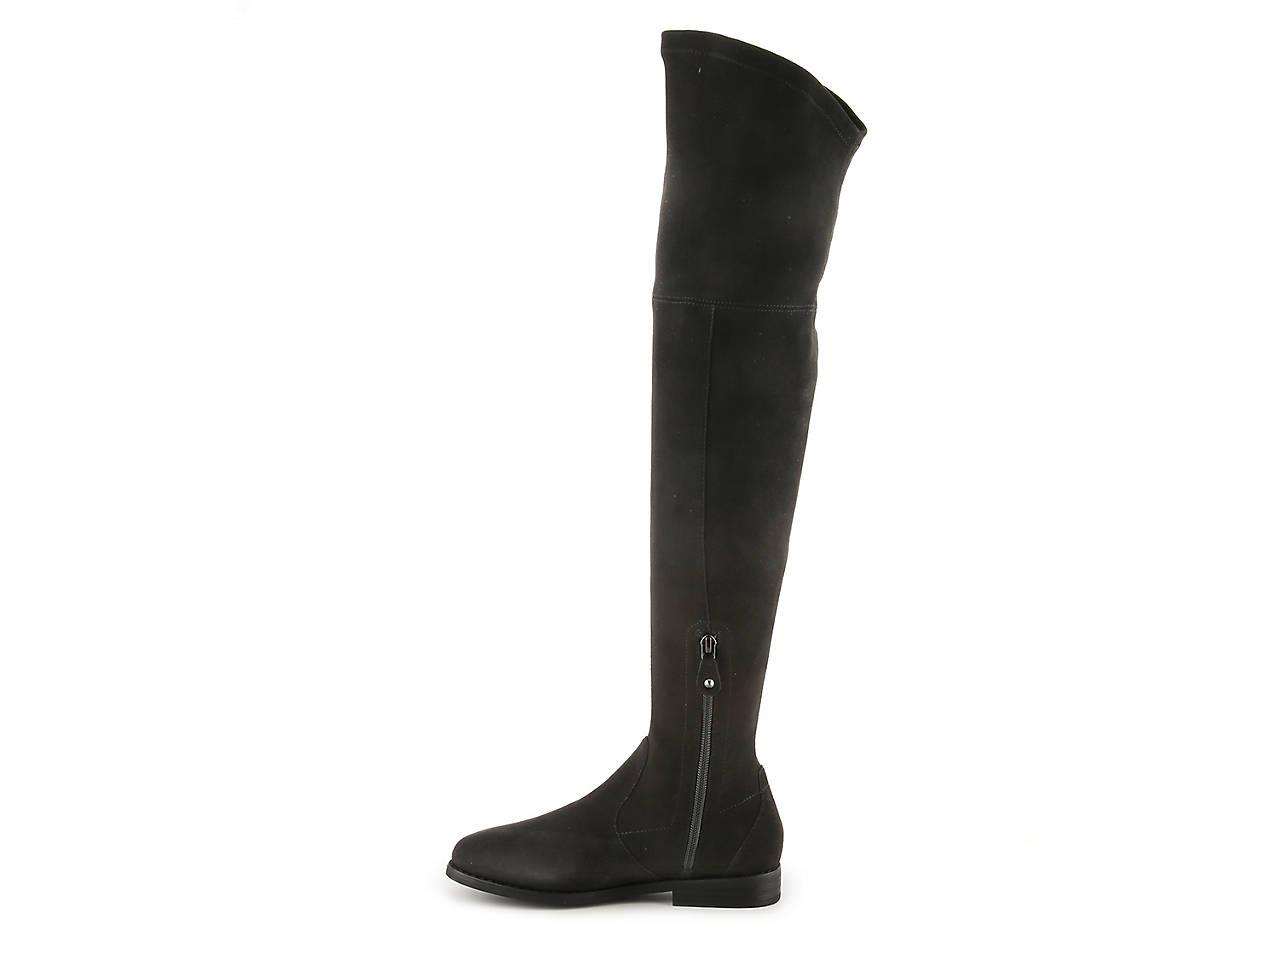 54dcb7468c5 Gentle Souls Emma Over The Knee Boot Women s Shoes